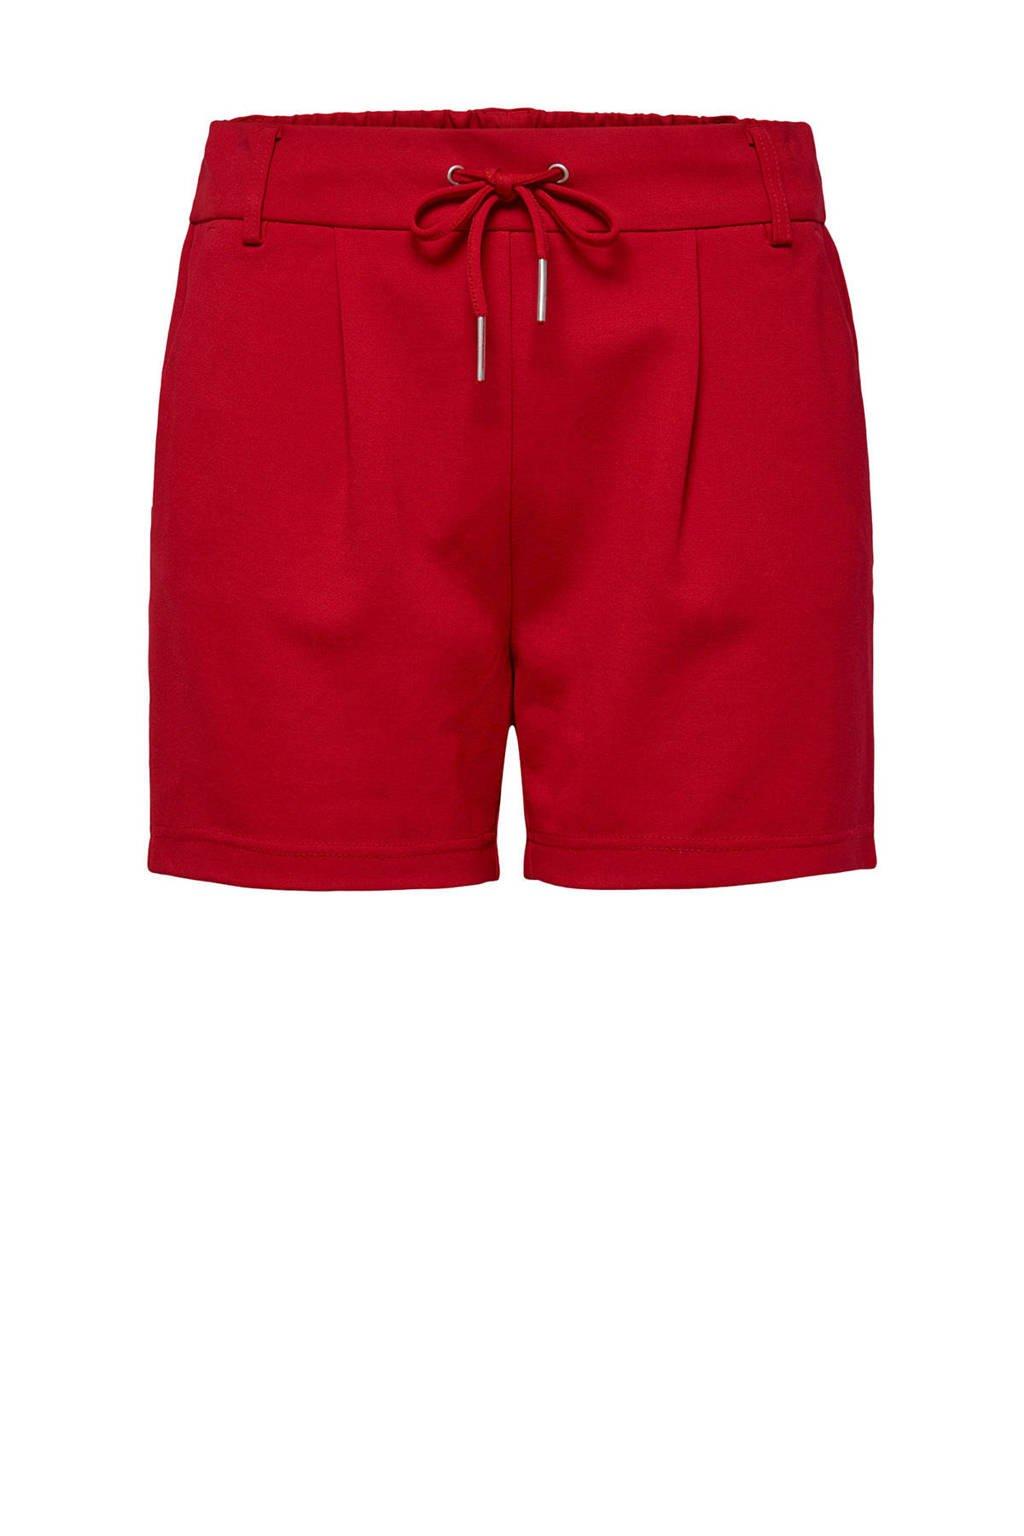 ONLY korte broek rood, Rood